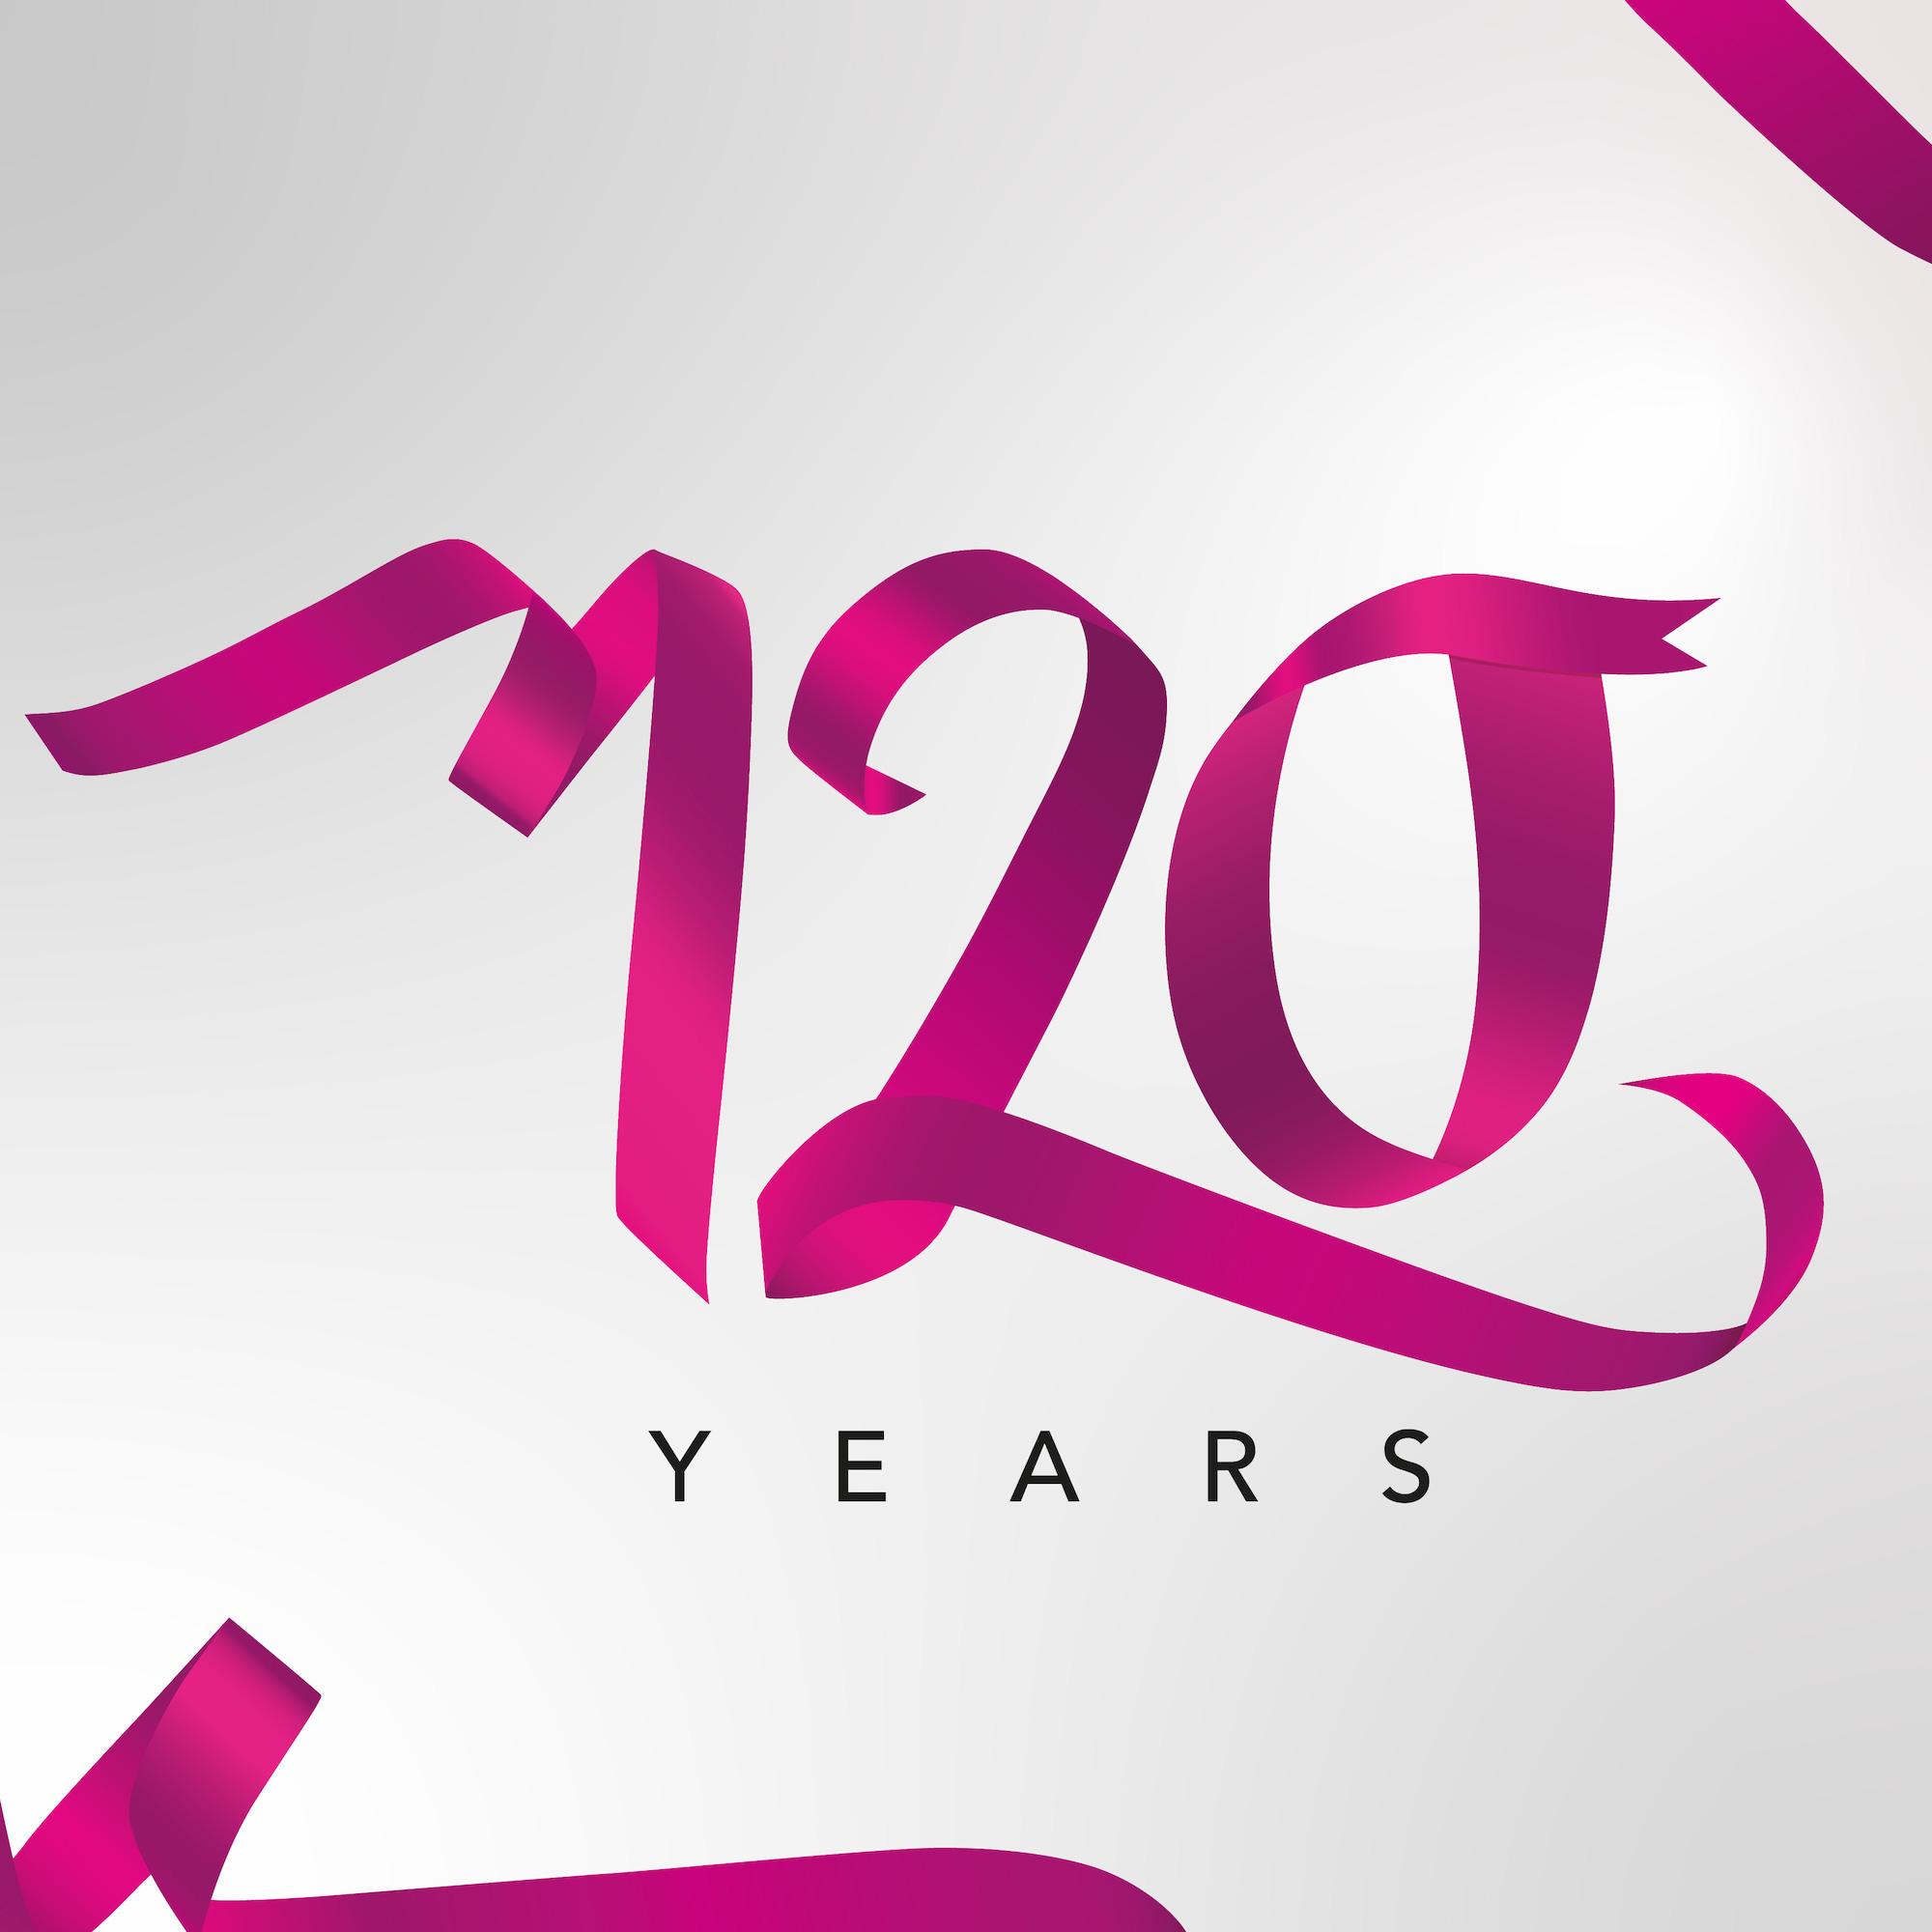 120 years image 1